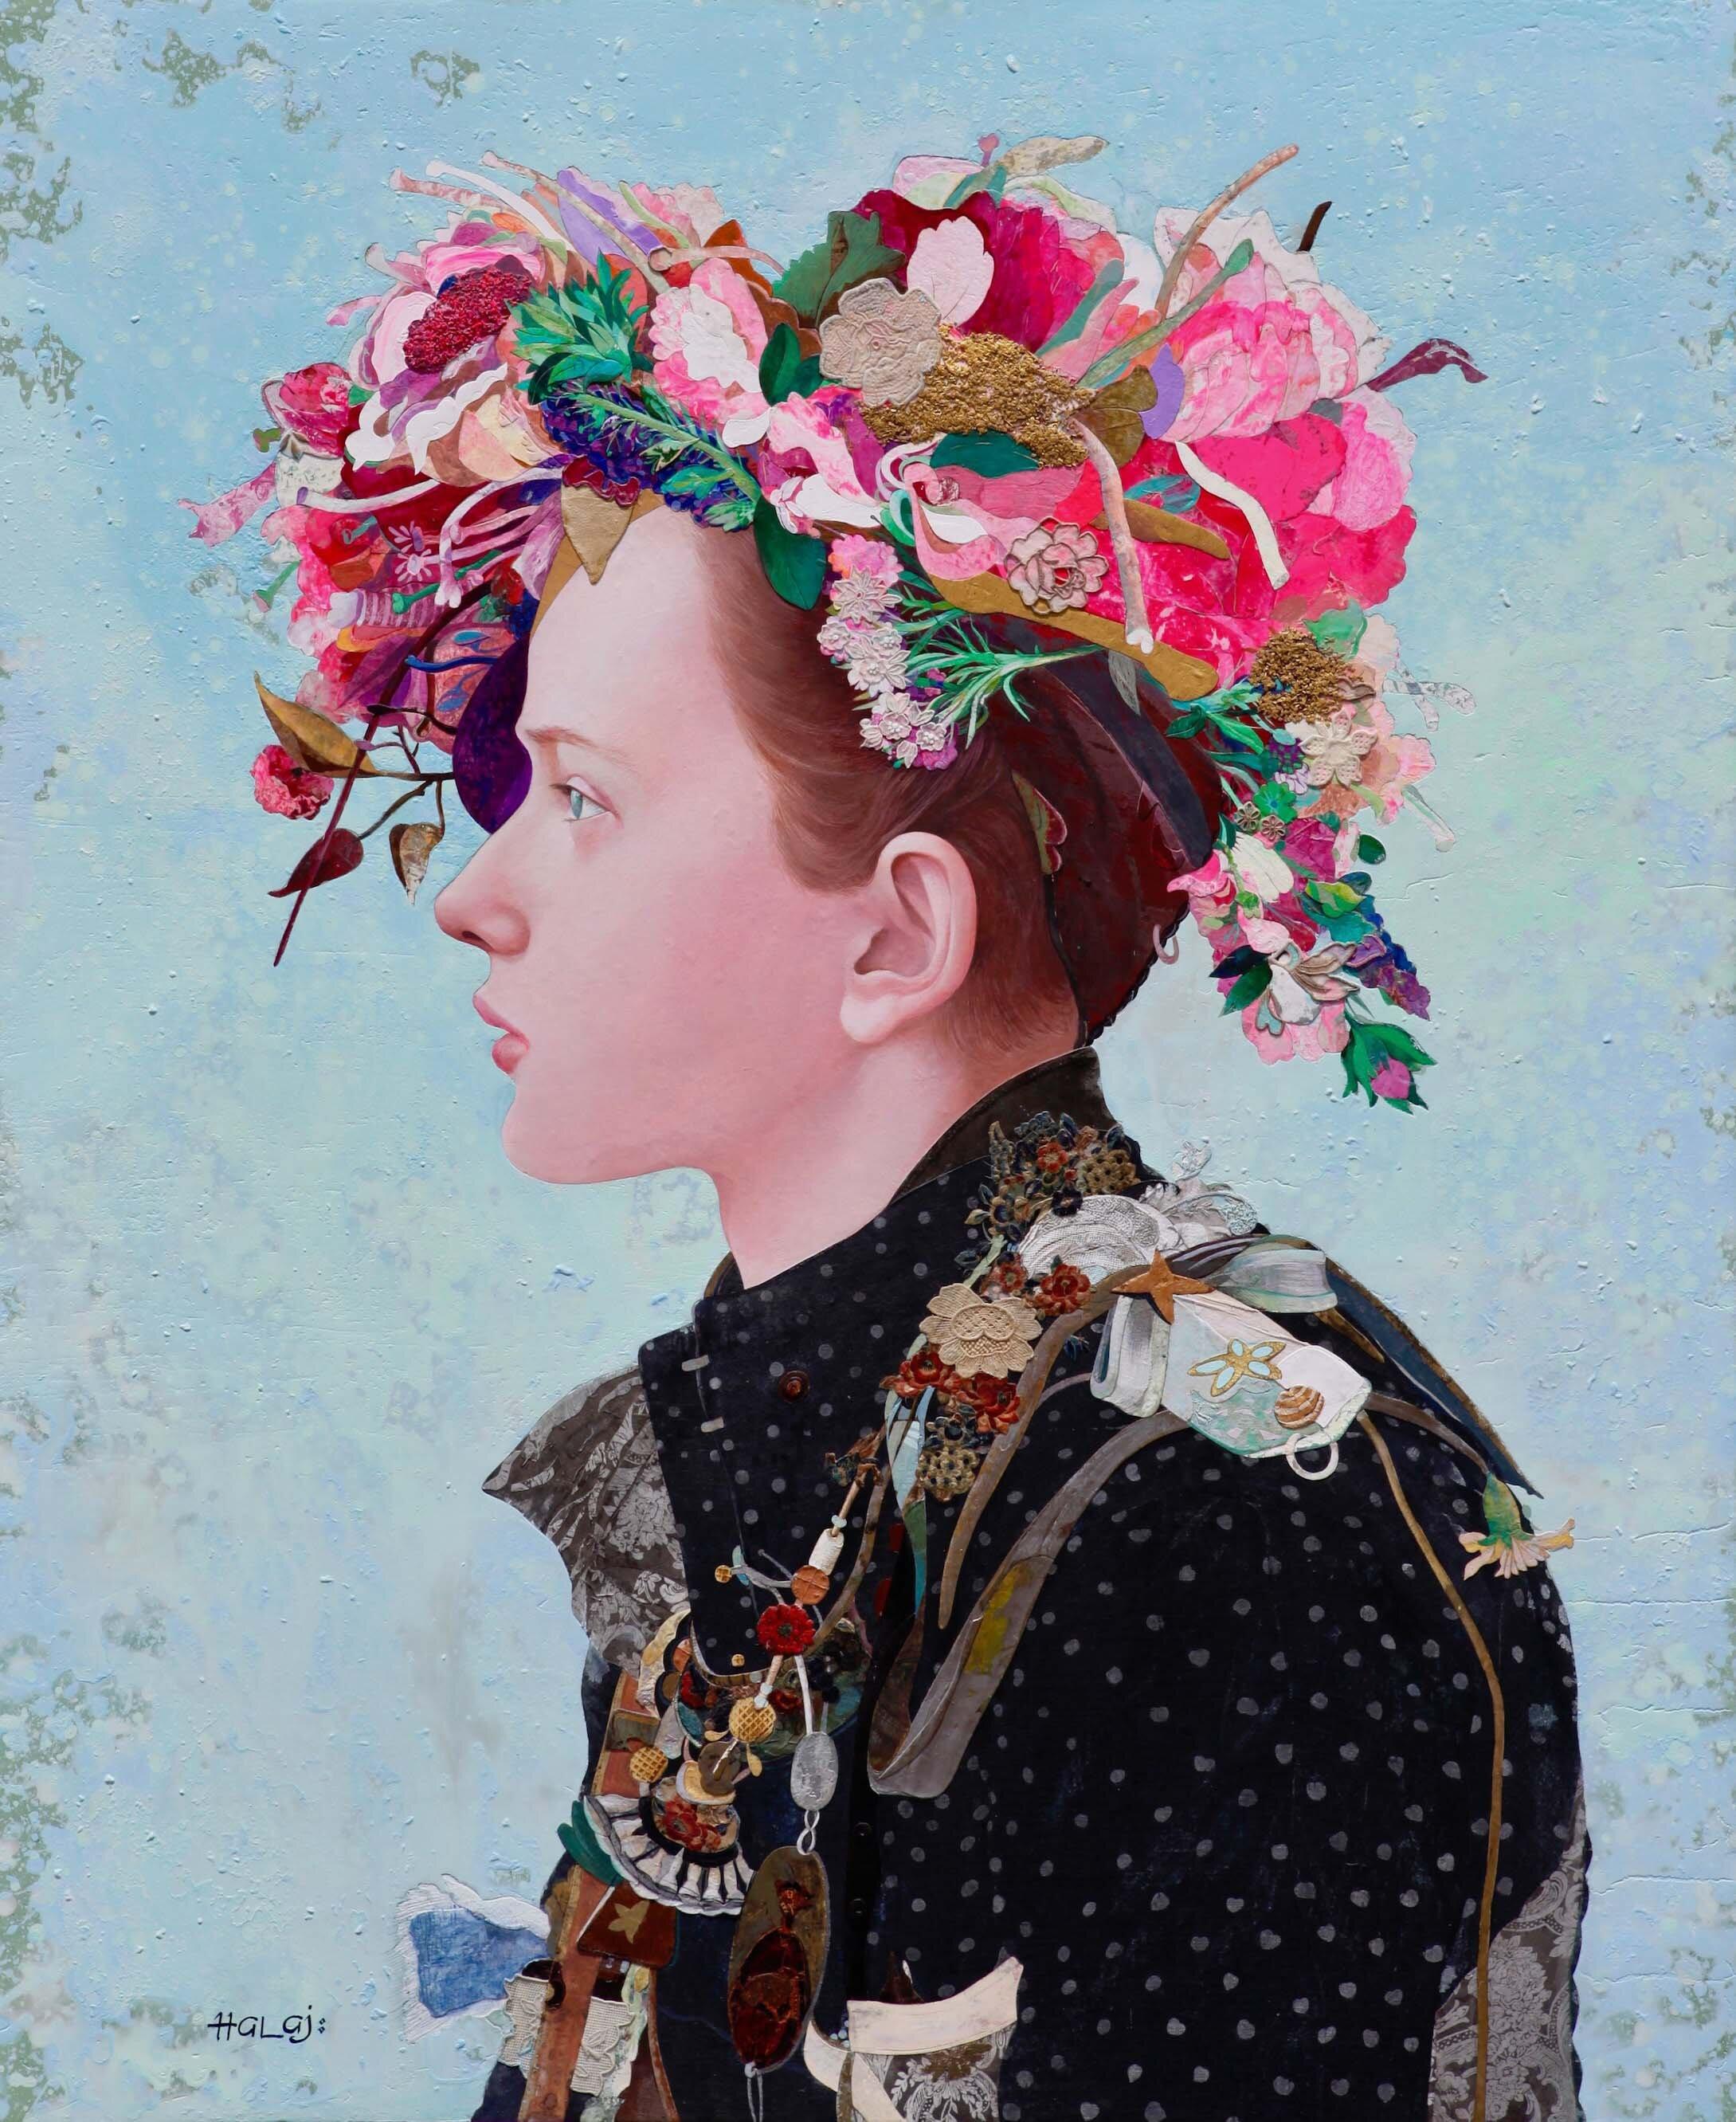 "Minas Halaj "" Floral Mind # 53 "" 2019, Oil Mixed Media On Panel, 56x46 inches ( 142.24x 116.84 cm.).jpg"